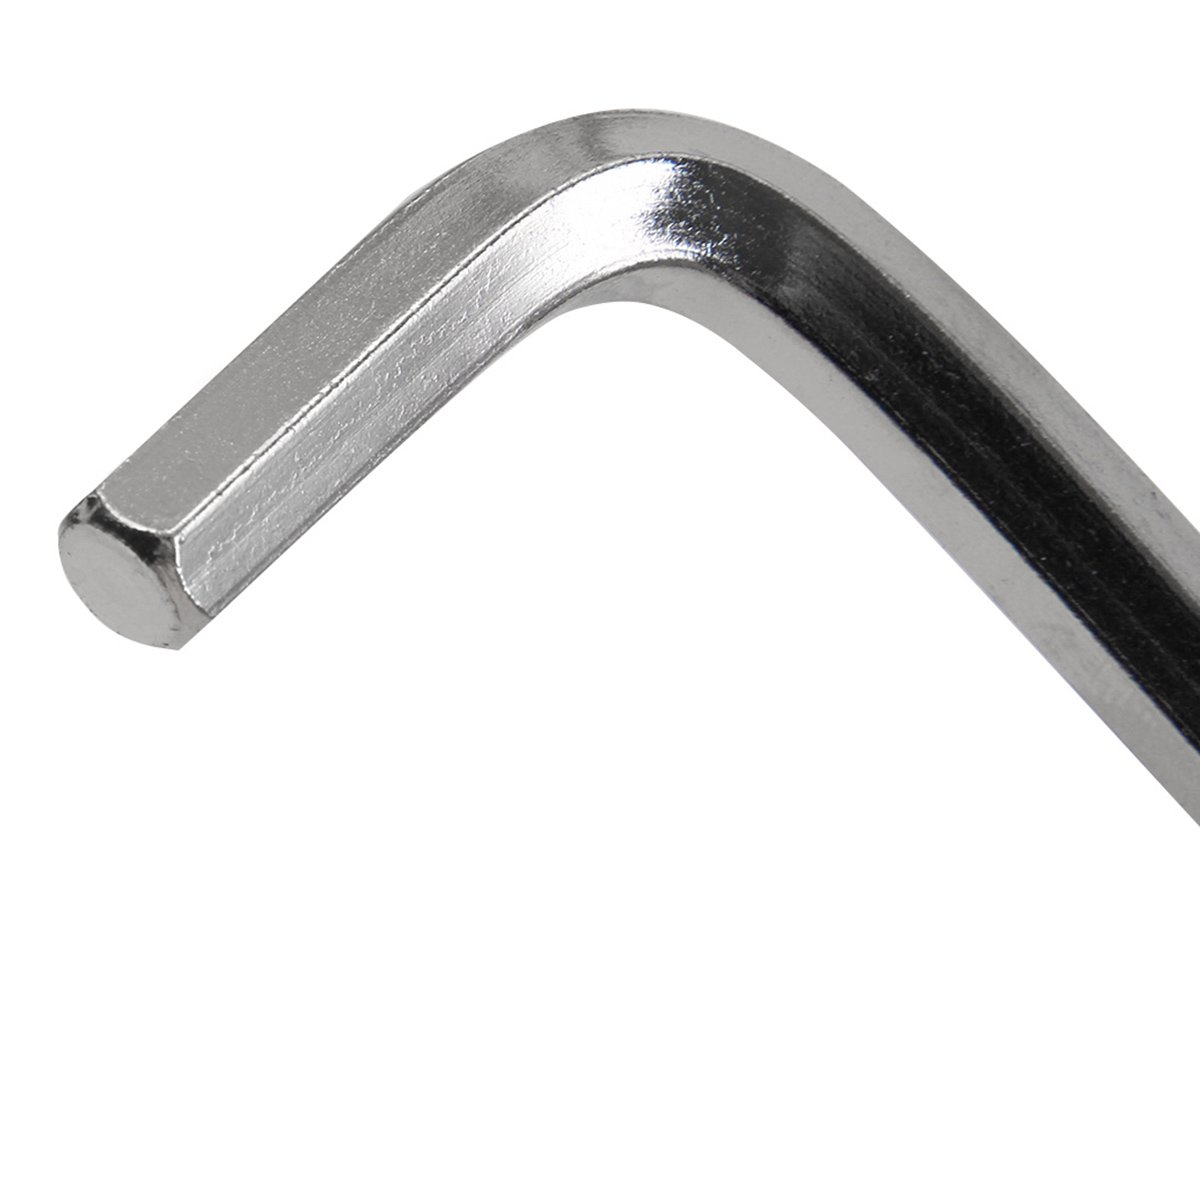 KSEIBI 201670 Extra Long Allen Hex Key Set 9Pcs SAE